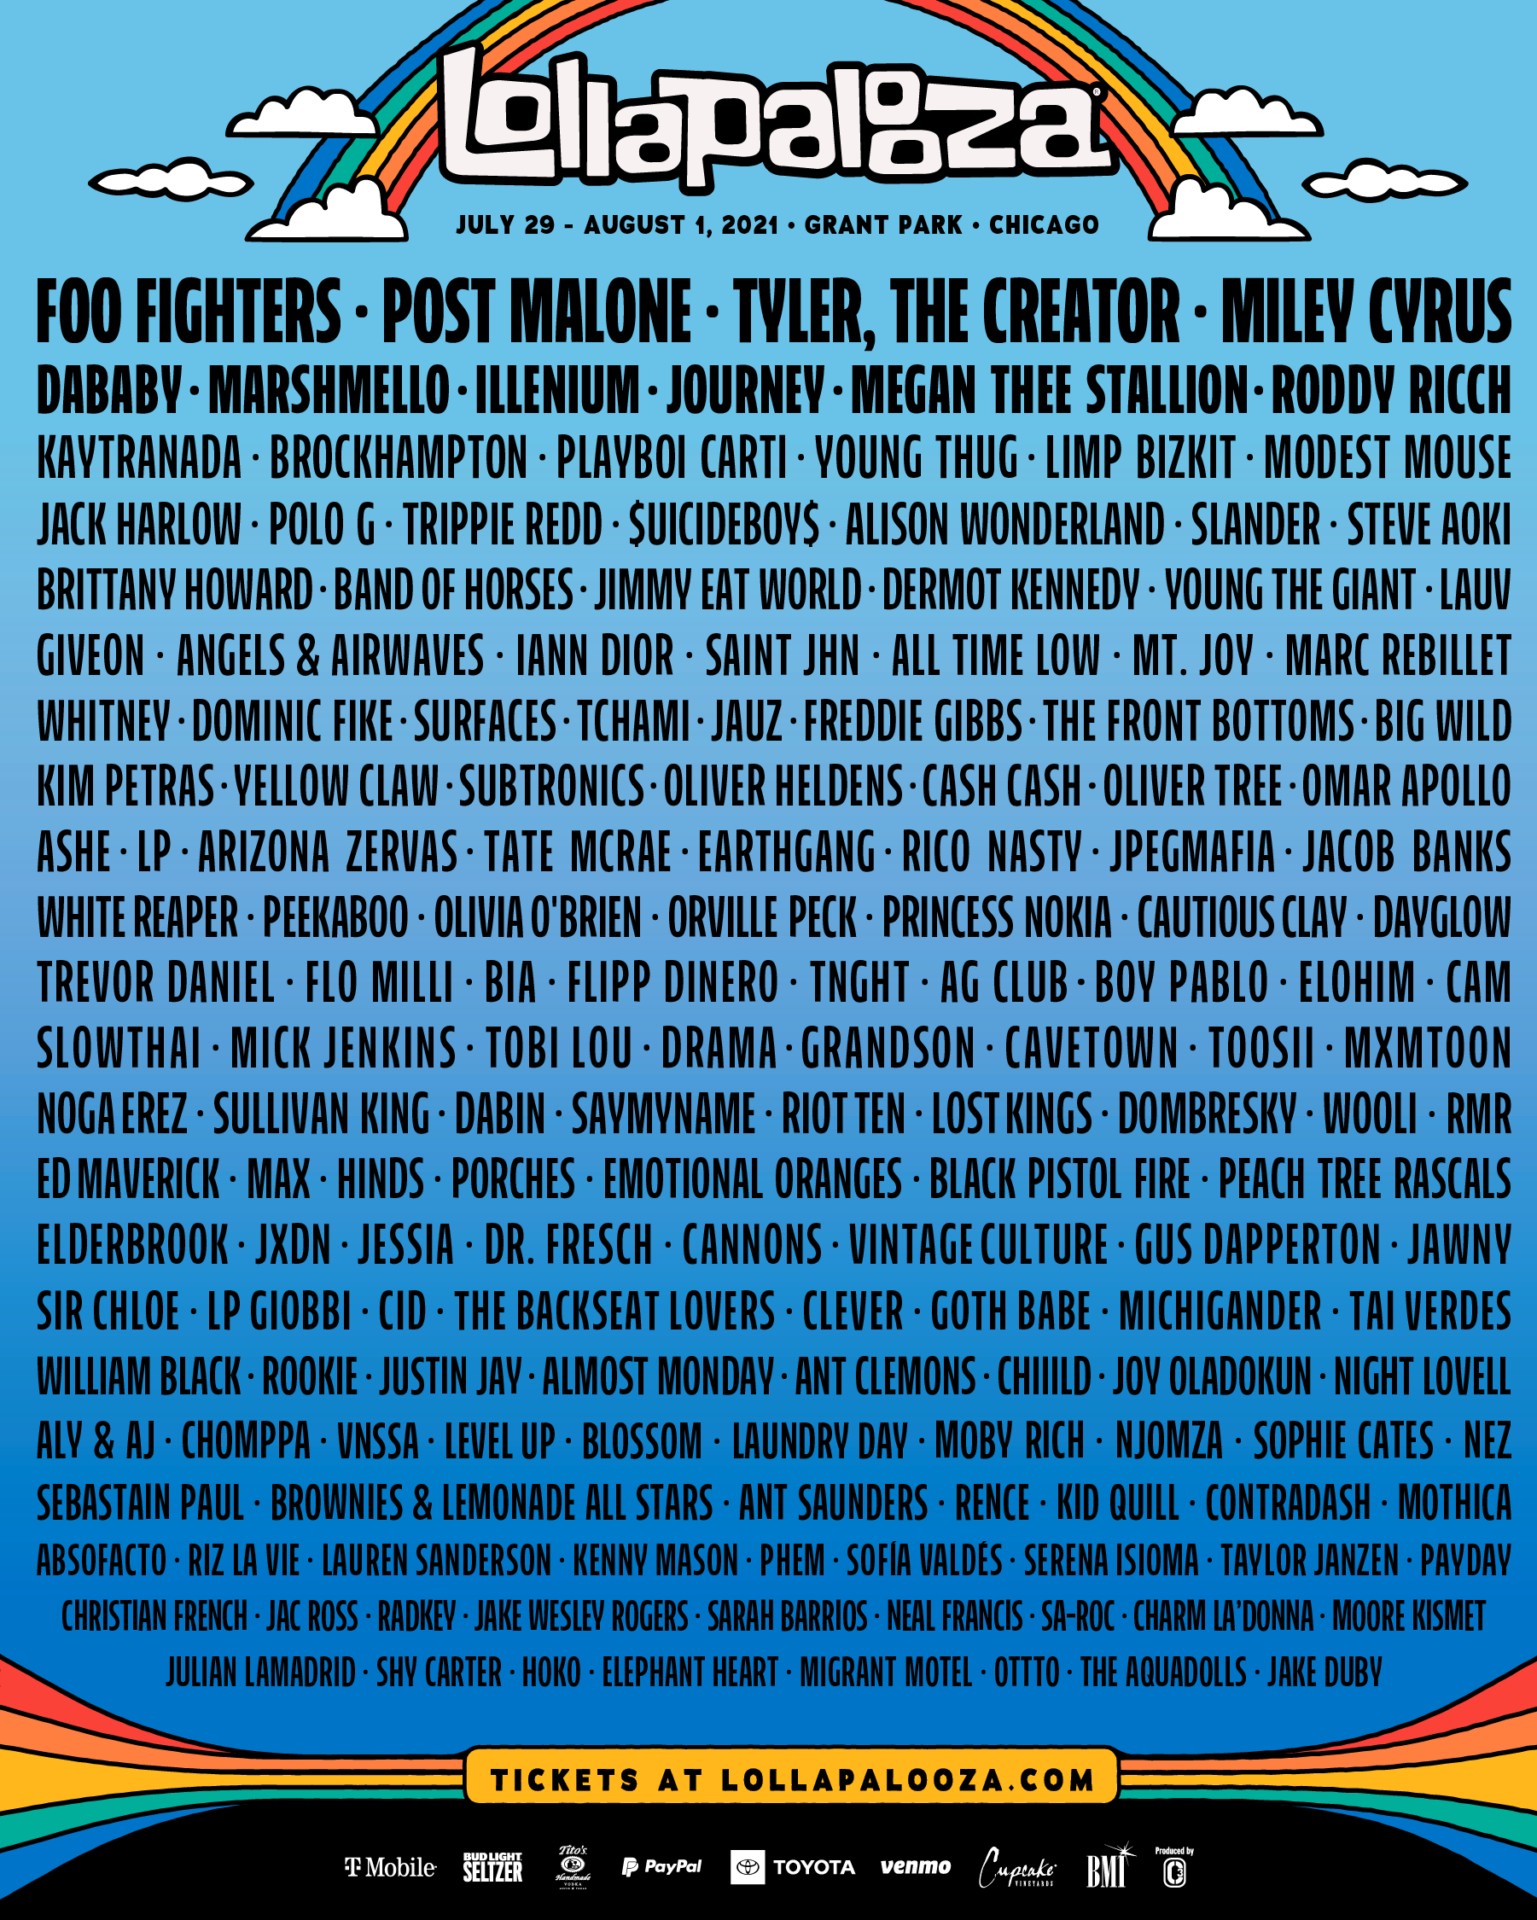 Lollapalooza 2021 Chicago